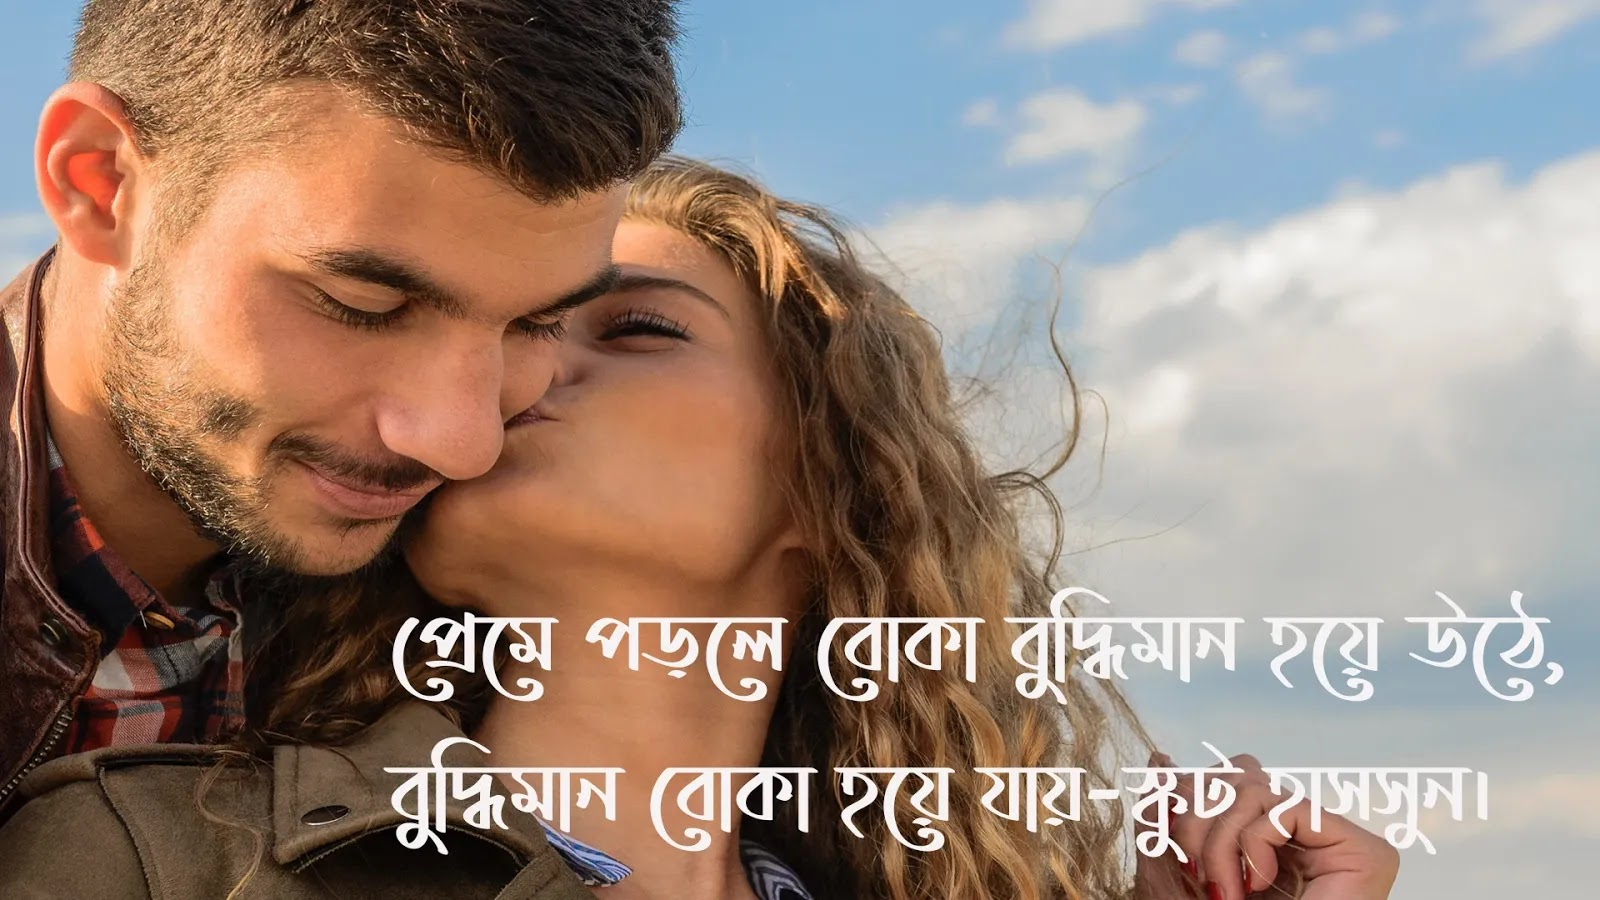 bengali sad quotes about friendship